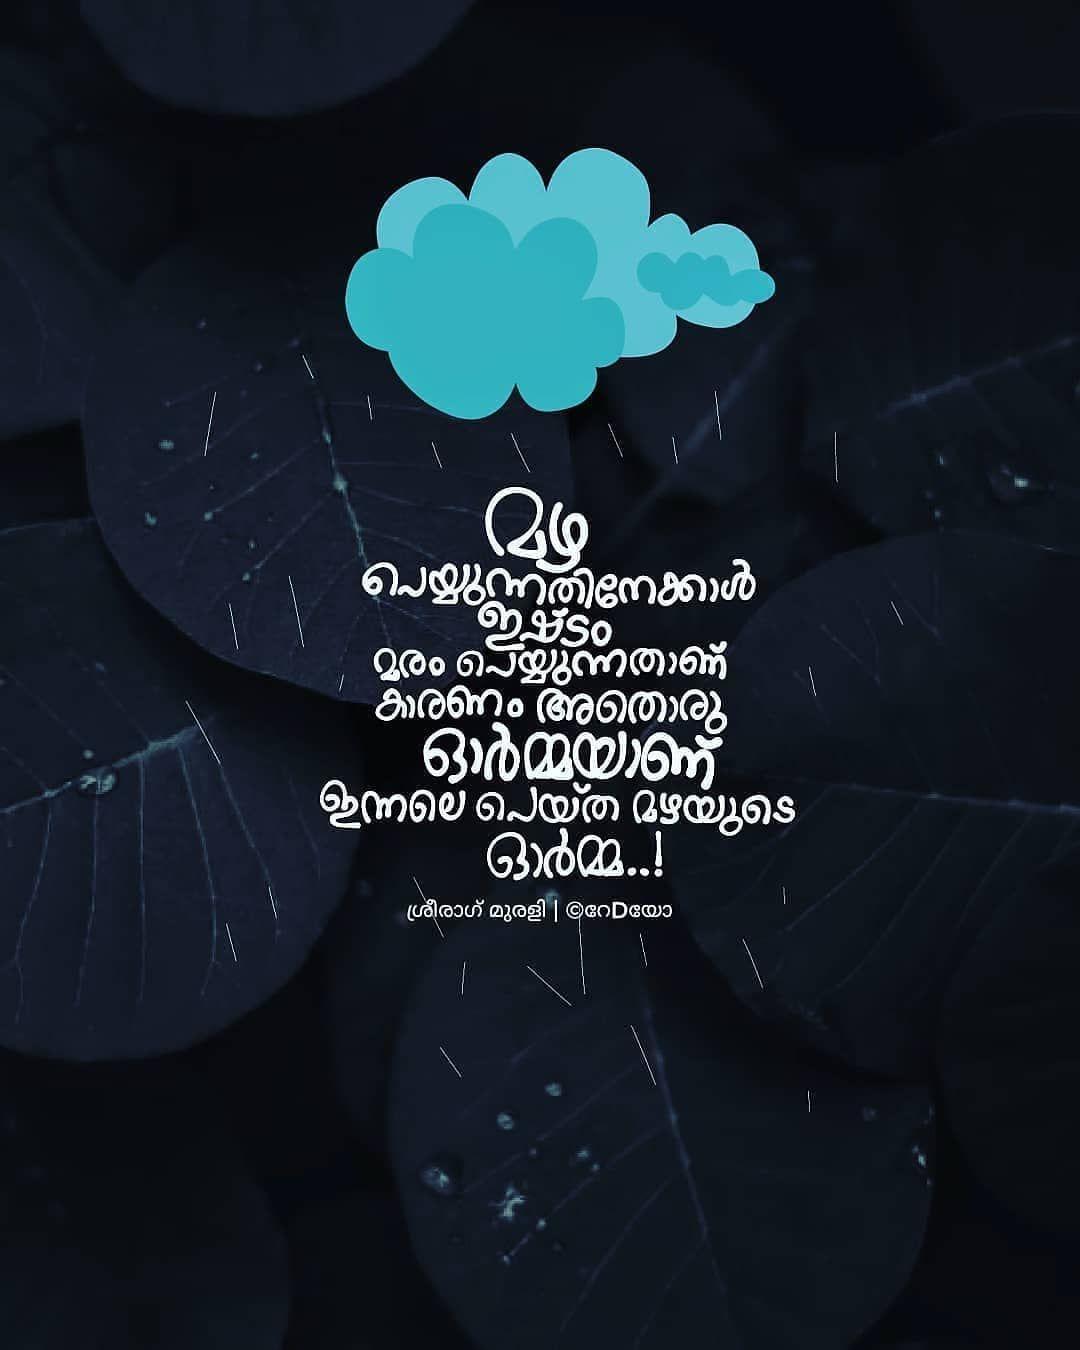 Malayalamtypography Thurumbedutha Radio മരപ പ യ ത ത T Radio Radiohaiku Radioq Malayalam Quotes Motivational Quotes Wallpaper Memories Quotes